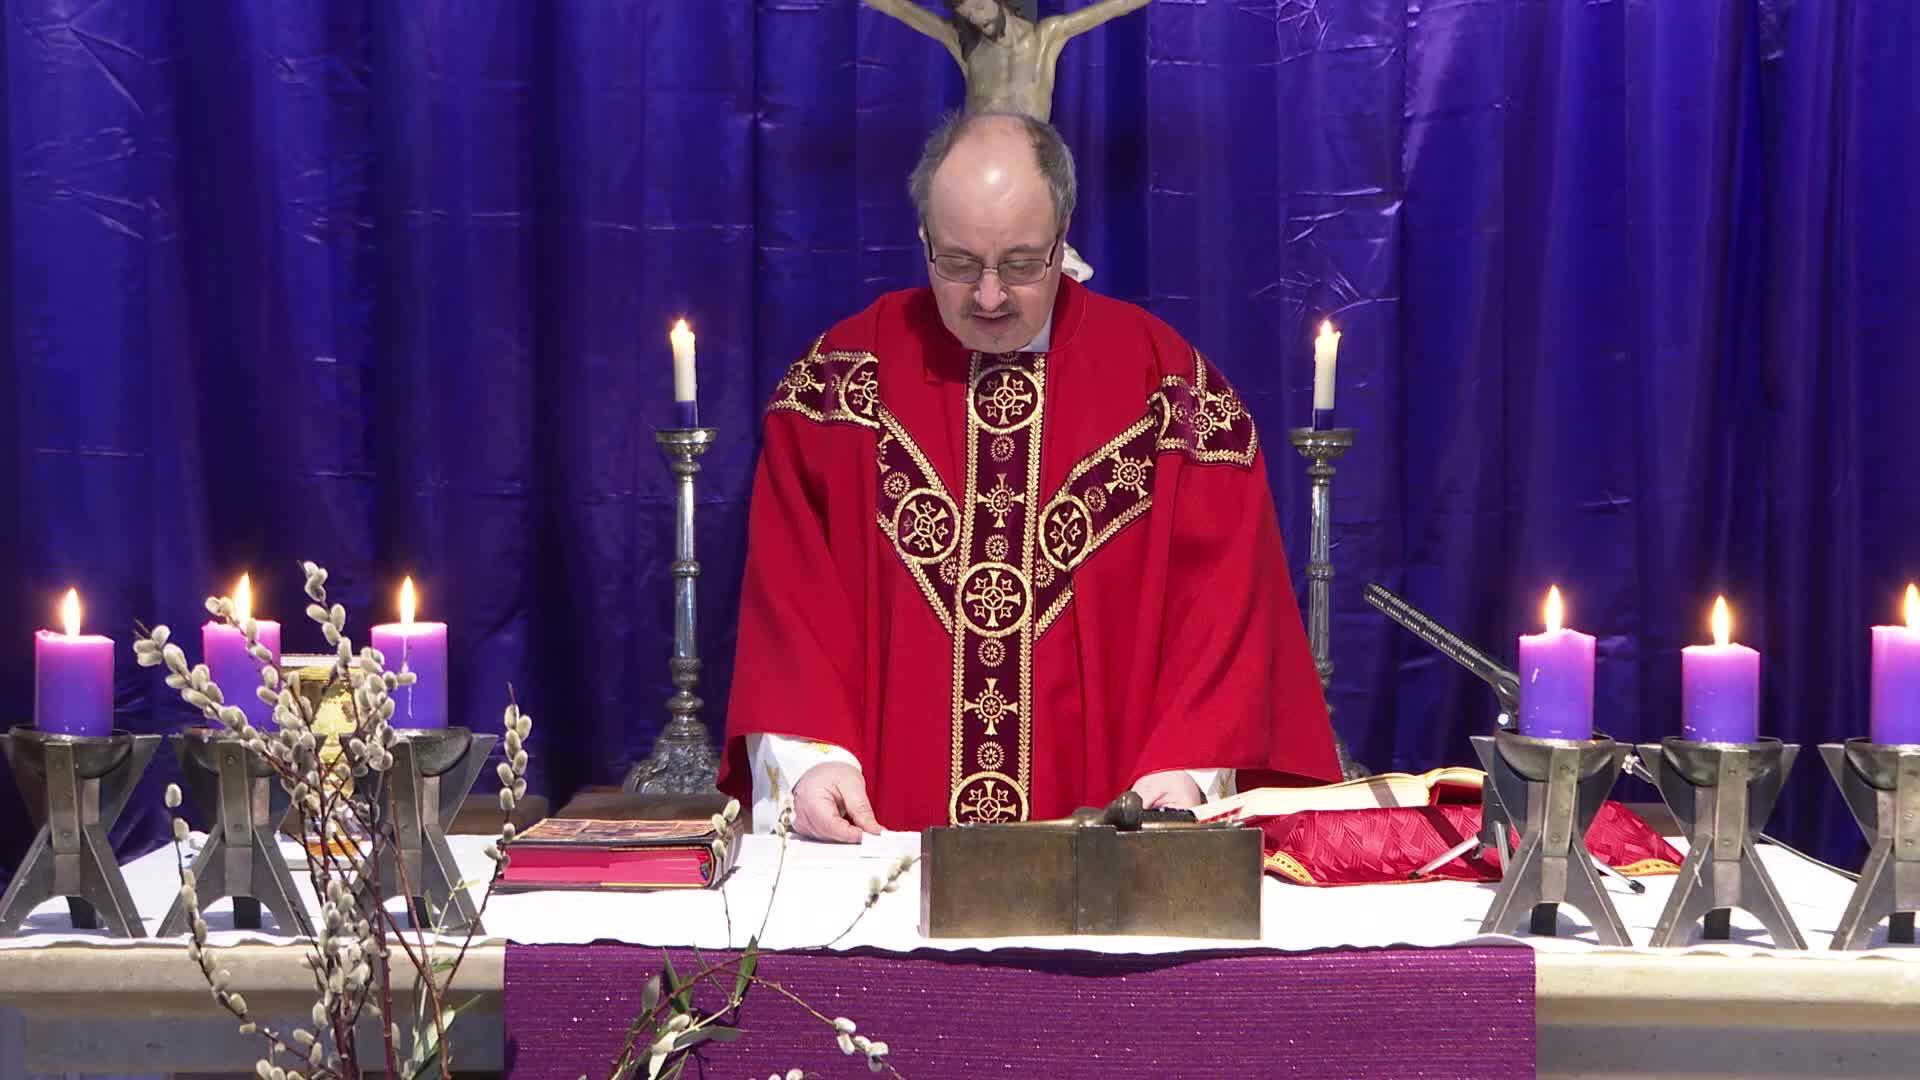 Messe 5-4-20 Palmsonntag